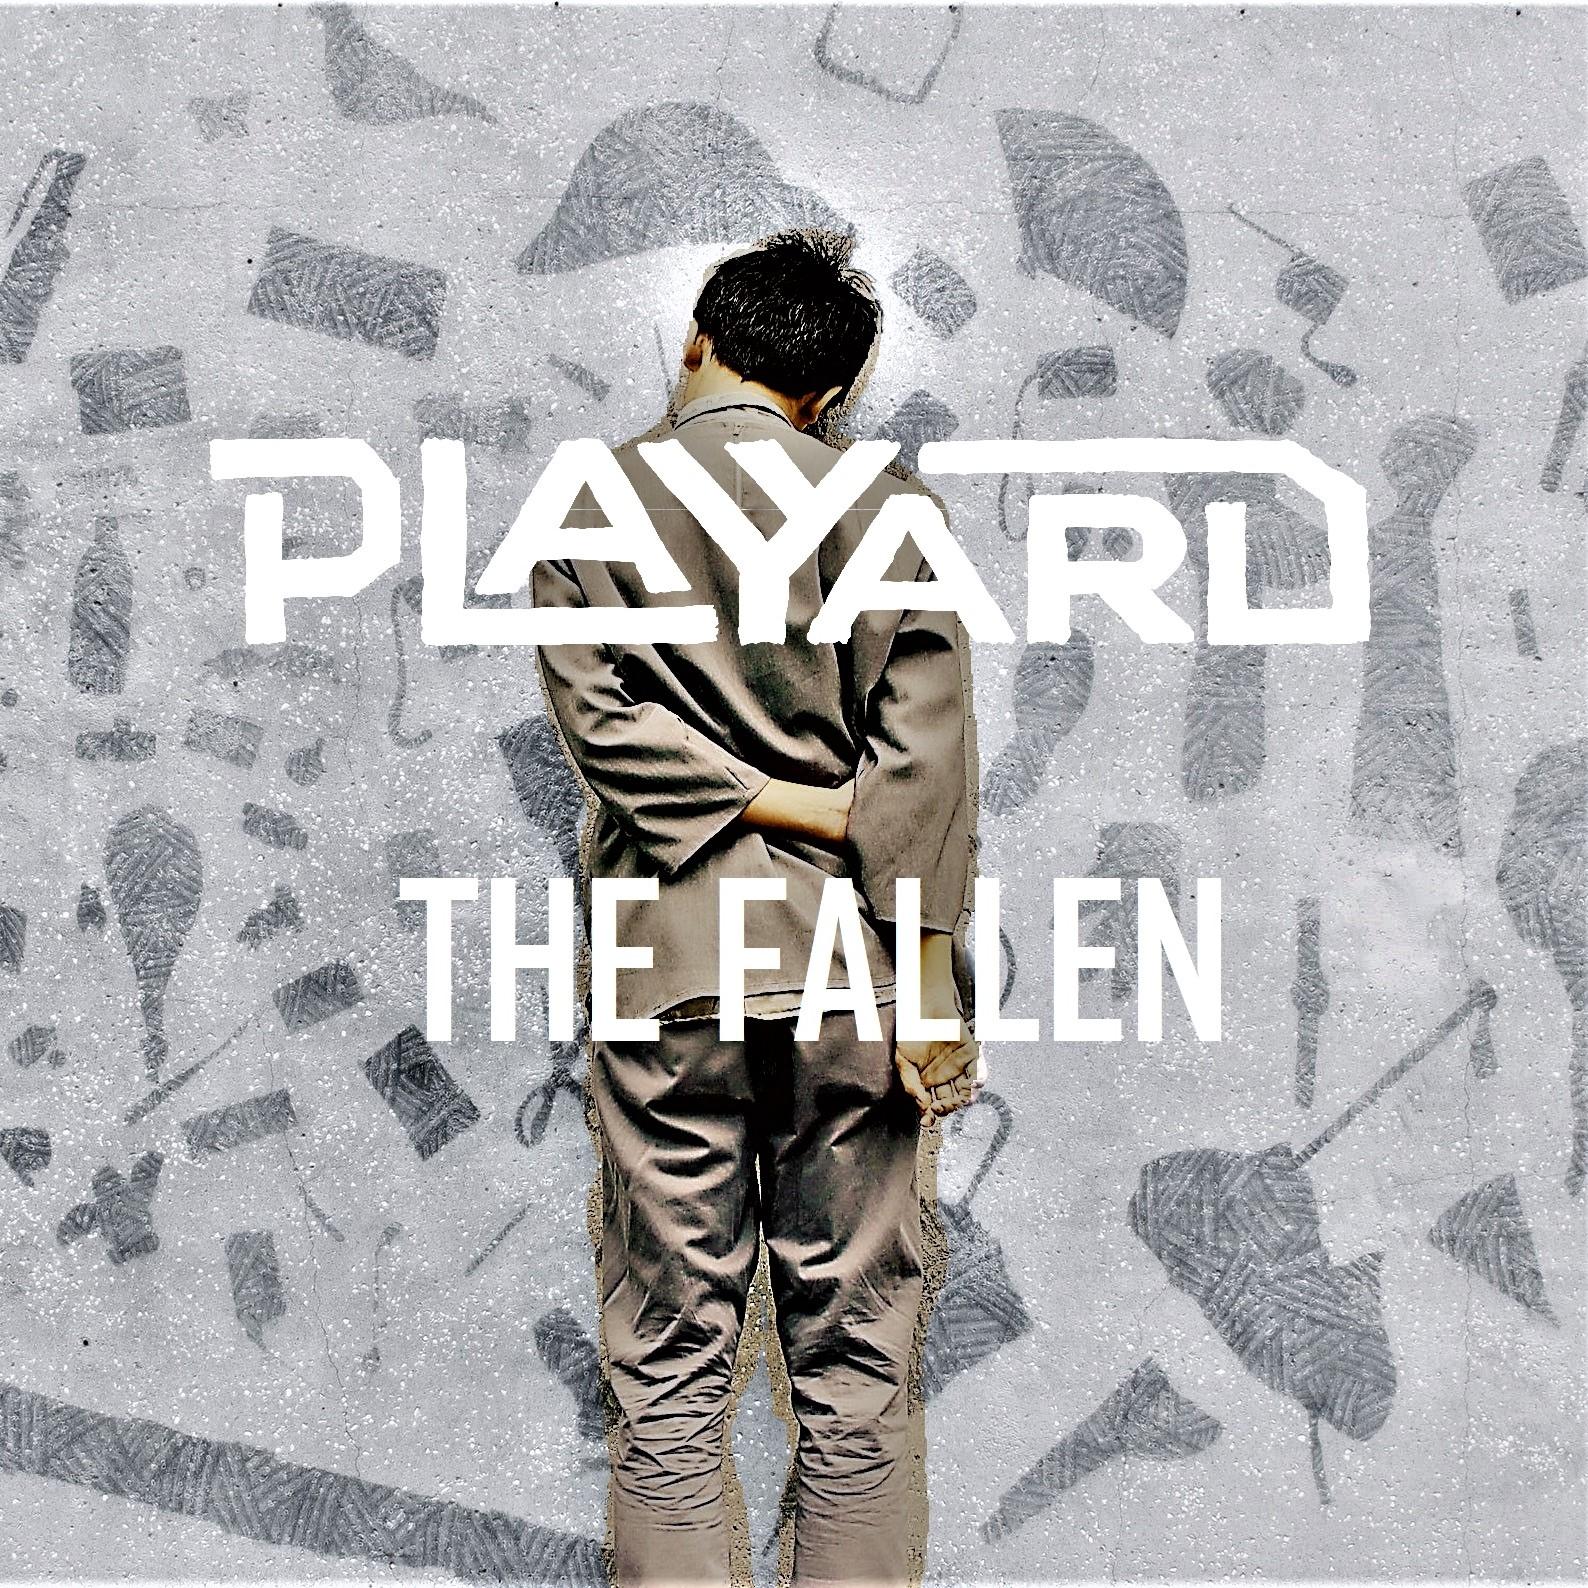 The Fallen Album Art.jpg